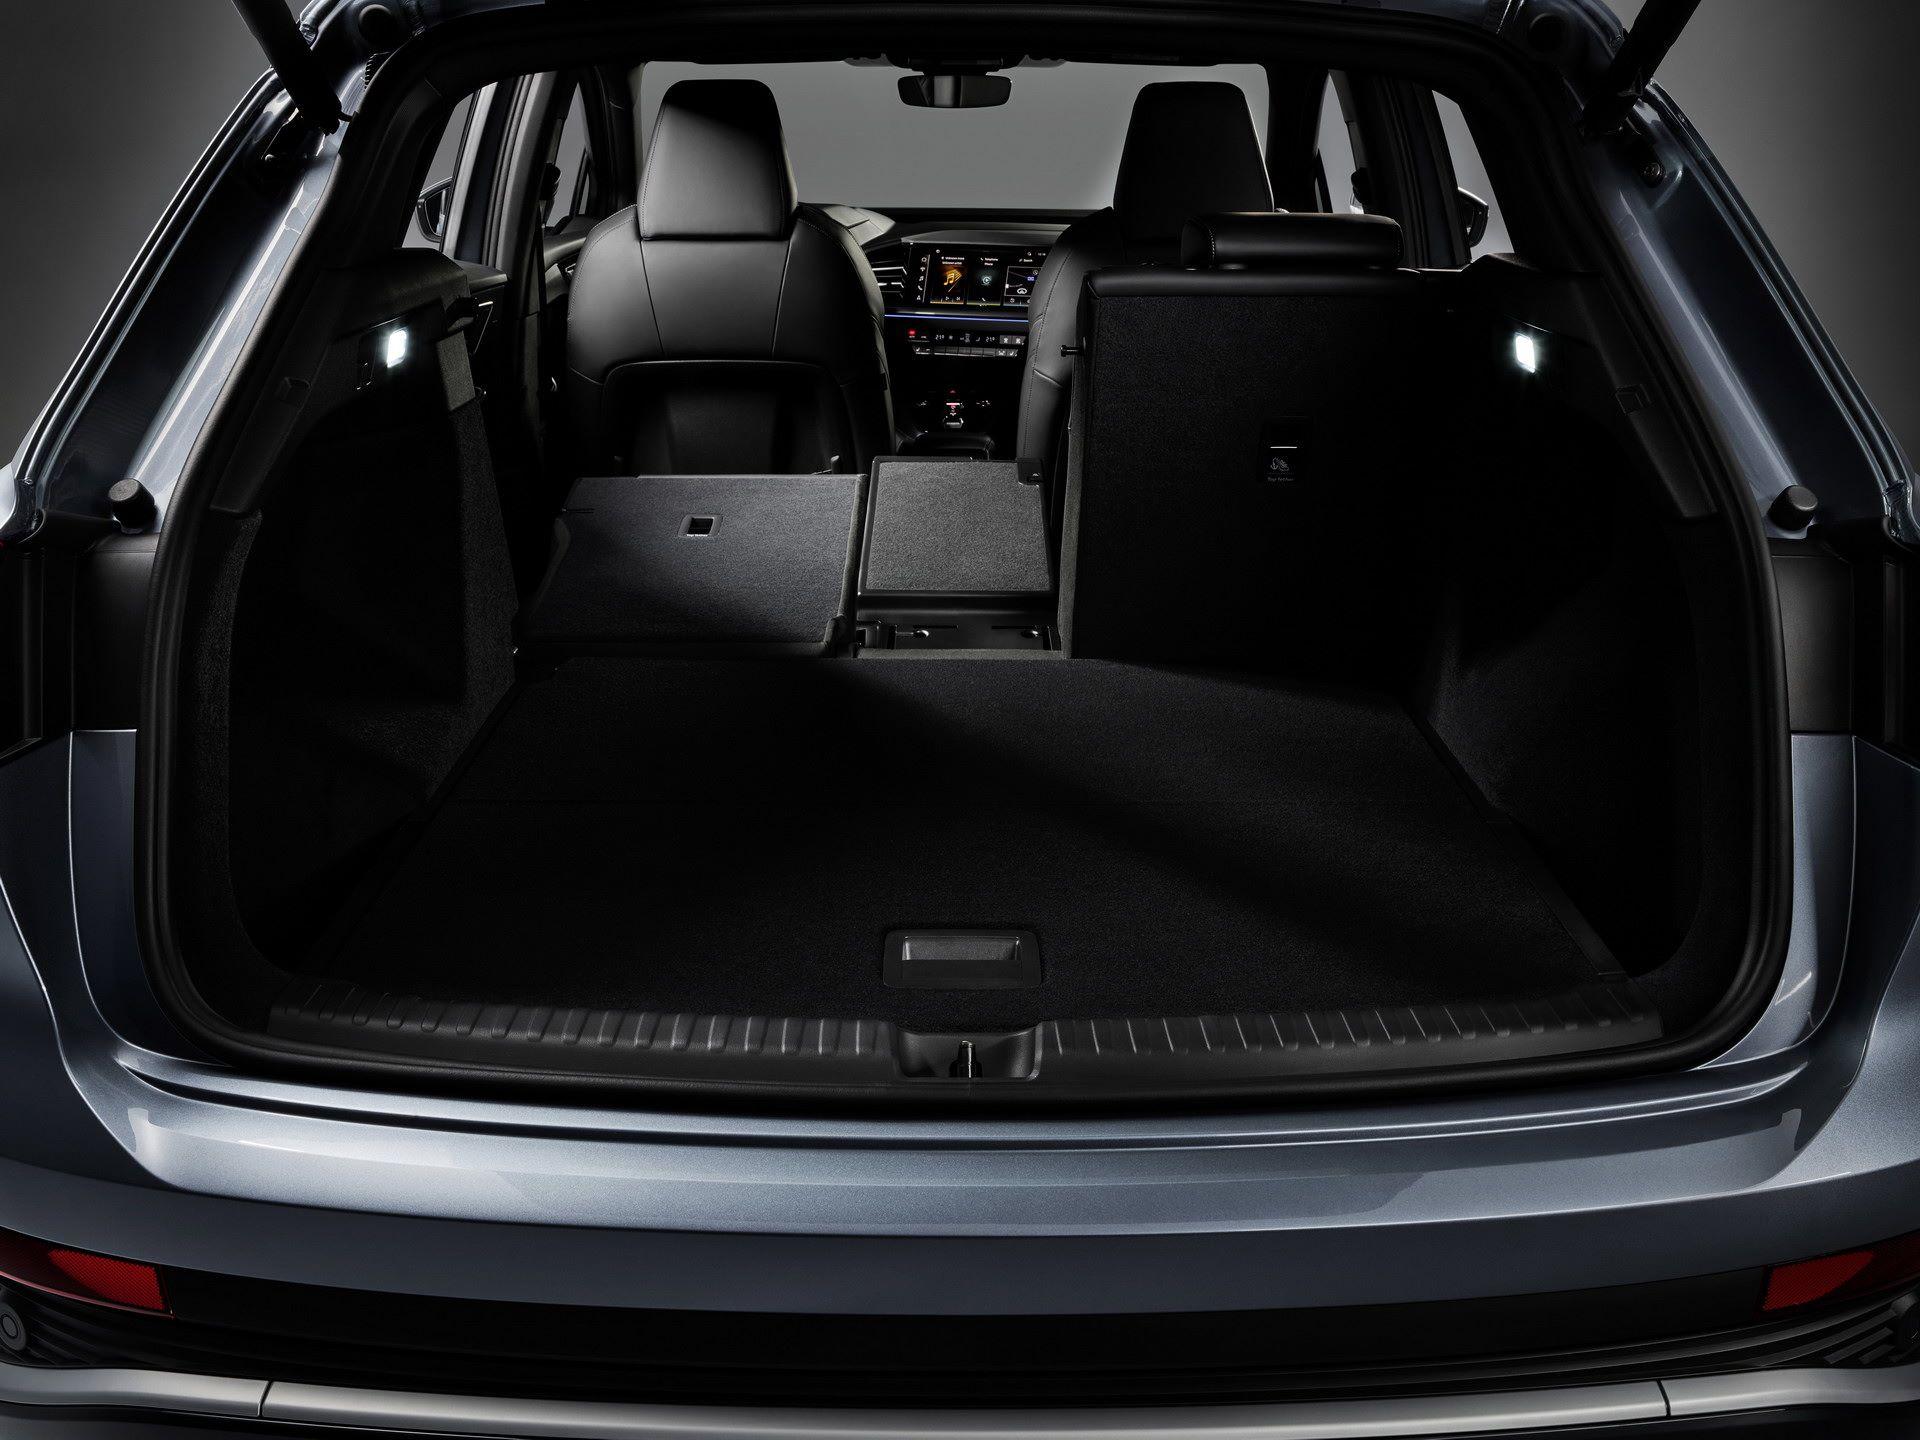 Audi-Q4-e-tron-and-Q4-e-tron-Sportback-71